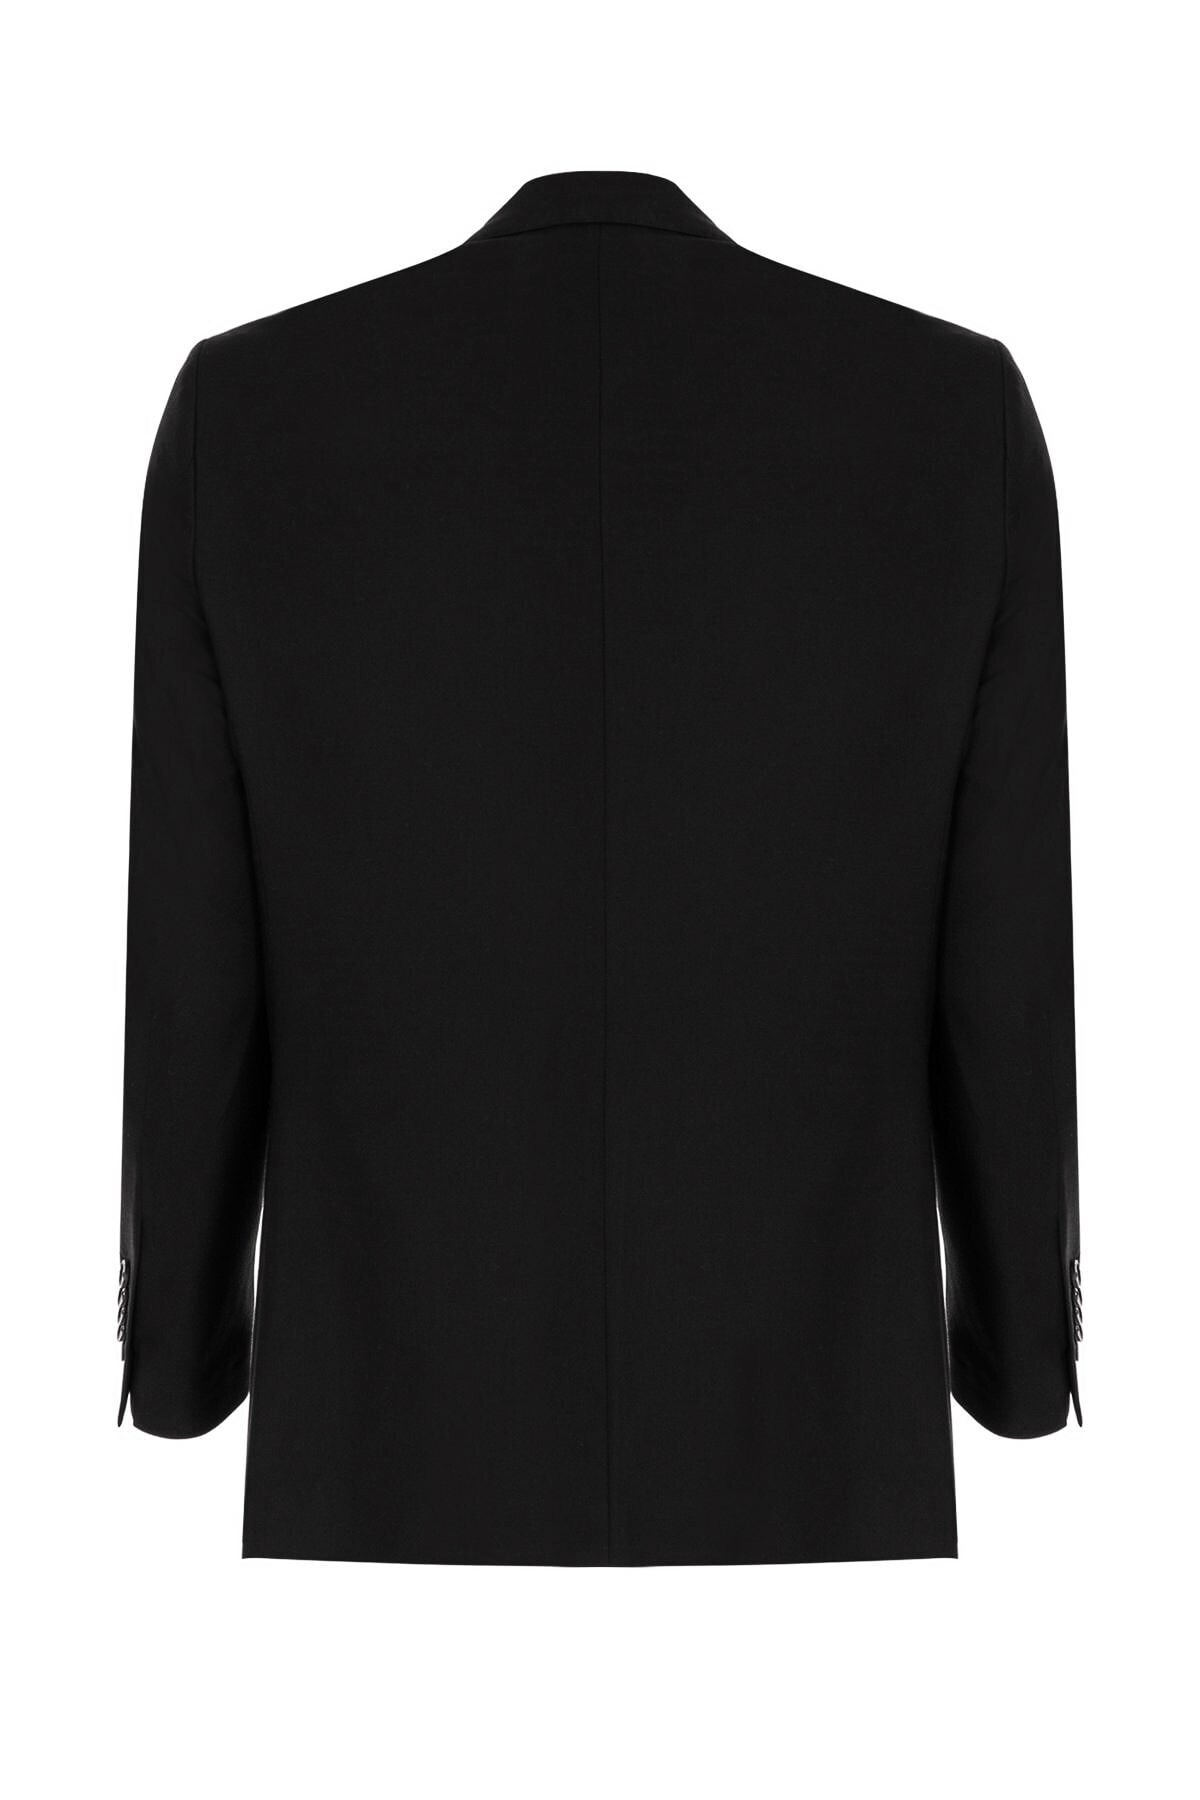 İgs Erkek Siyah Regularfıt / Rahat Kalıp Std Takım Elbise 2